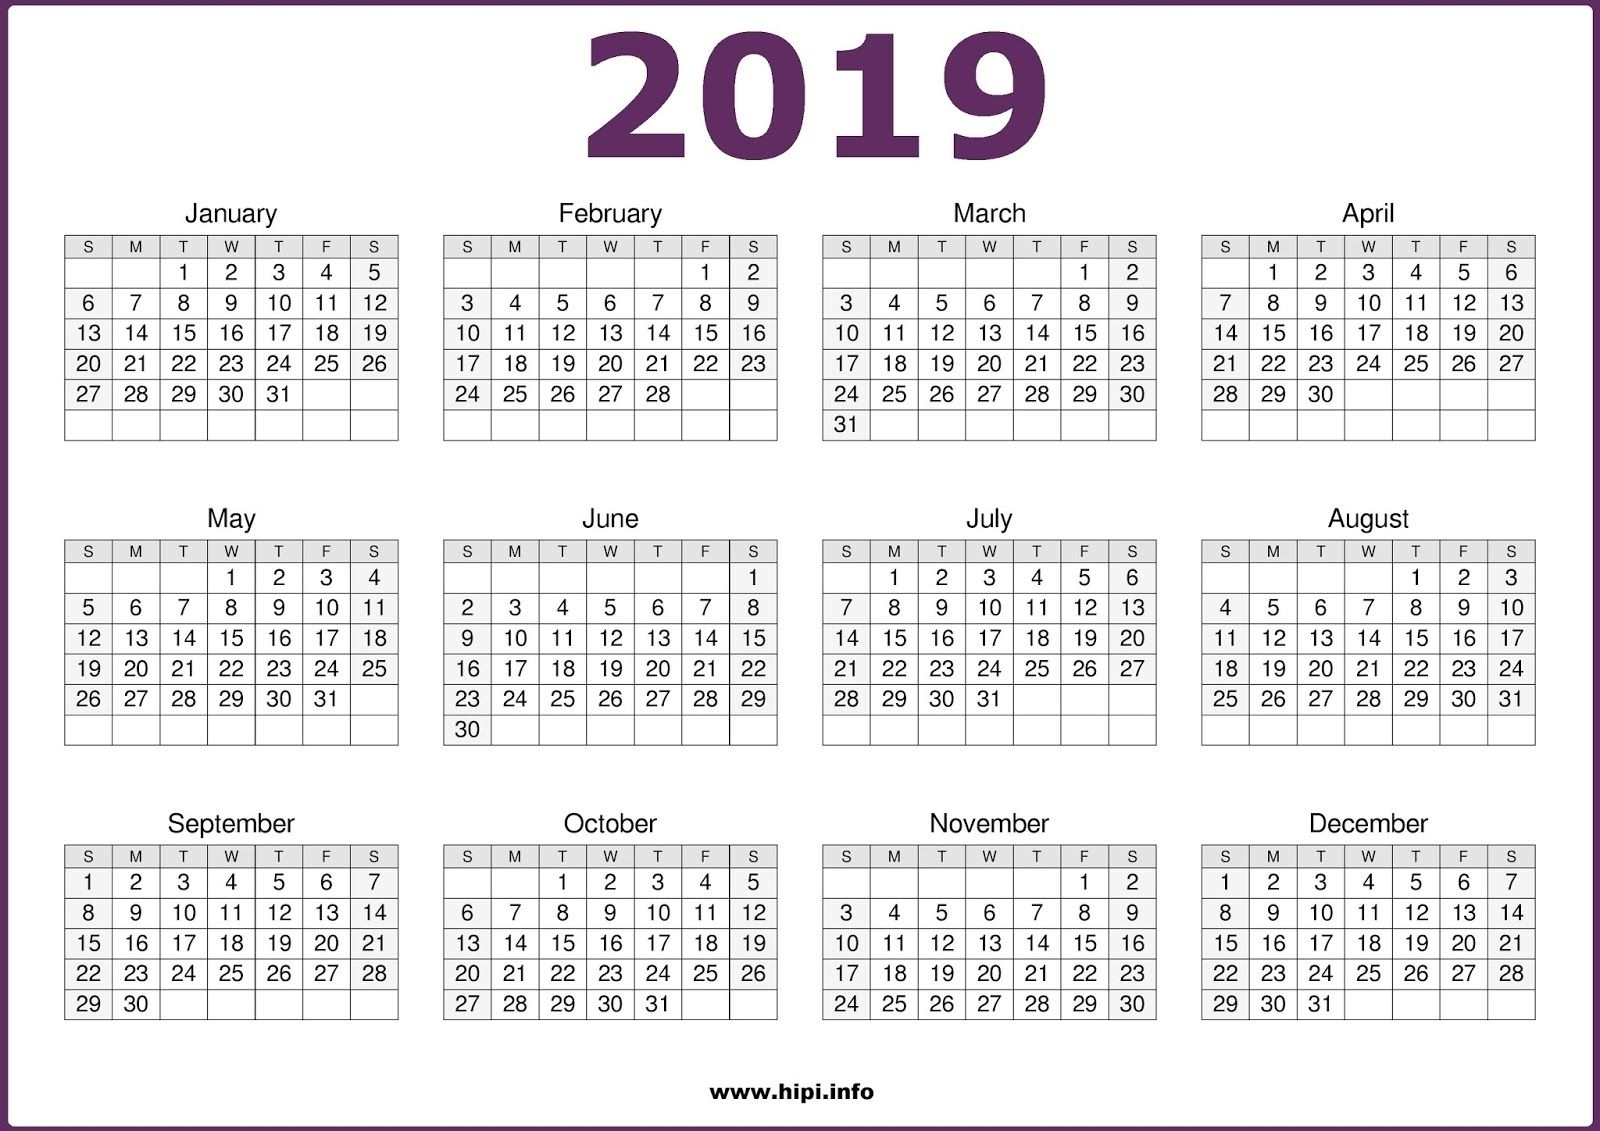 2019 Calendar Printable | 2019 Printable Calendars | Calendar 2019 regarding 12 Months Printable Calendar Whole